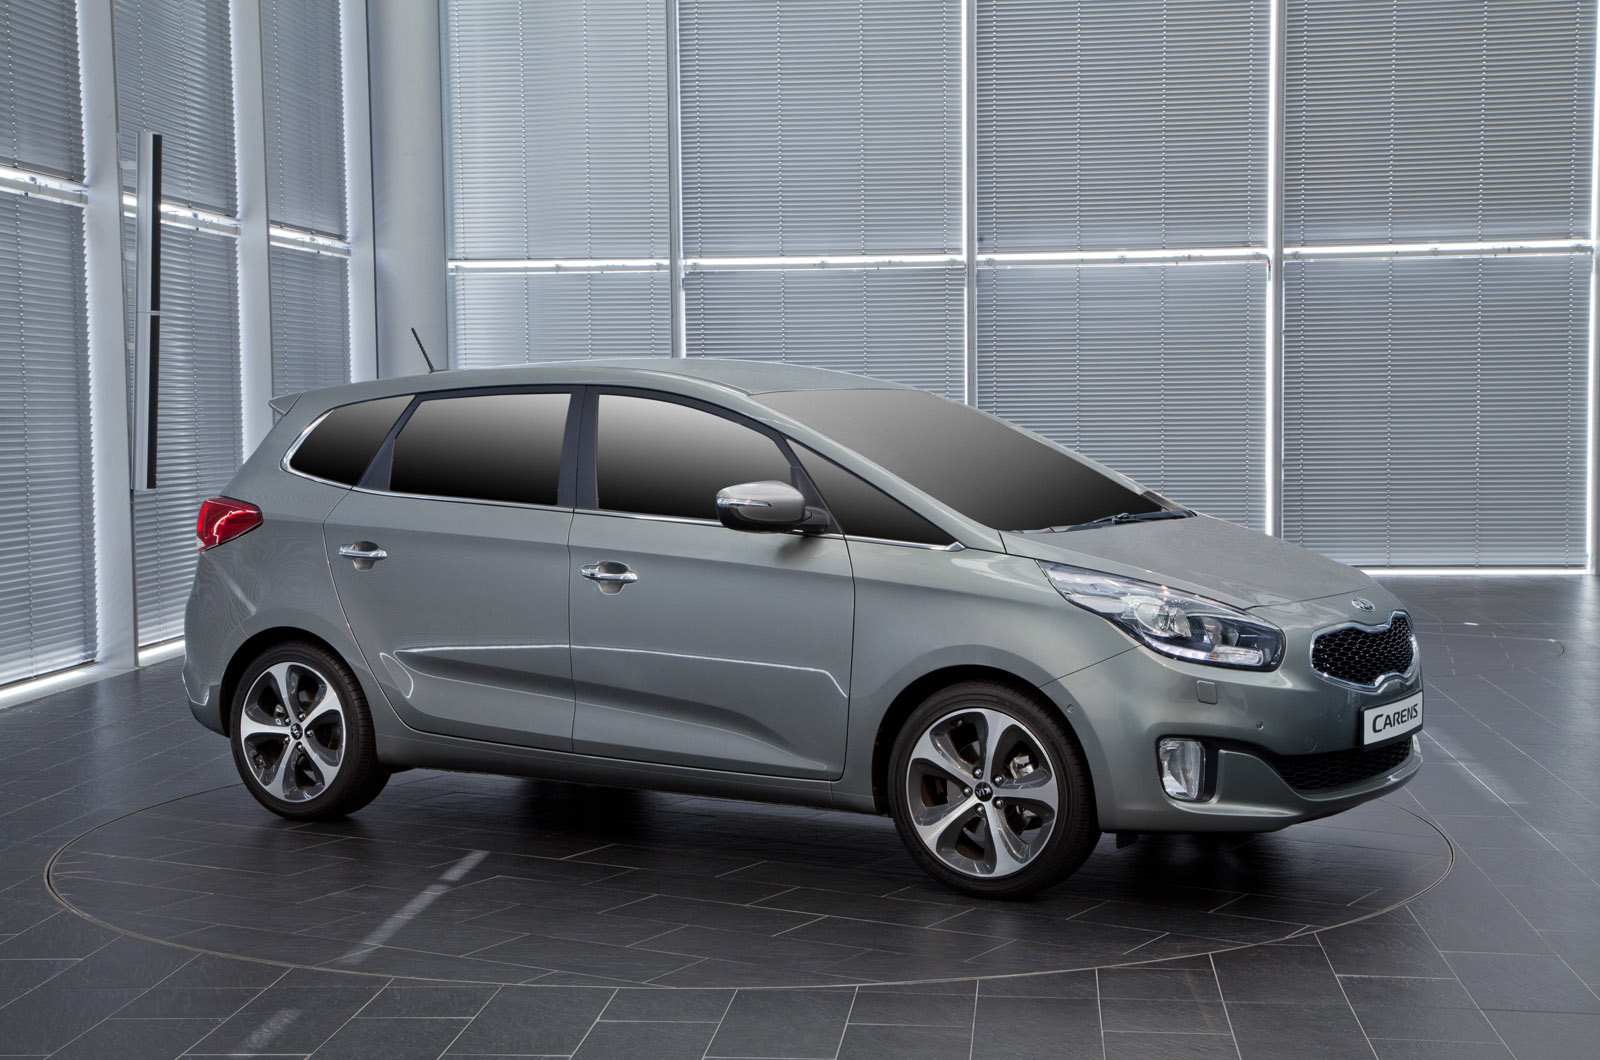 2014 Kia Carens/Rondo - HD Pictures @ carsinvasion.com